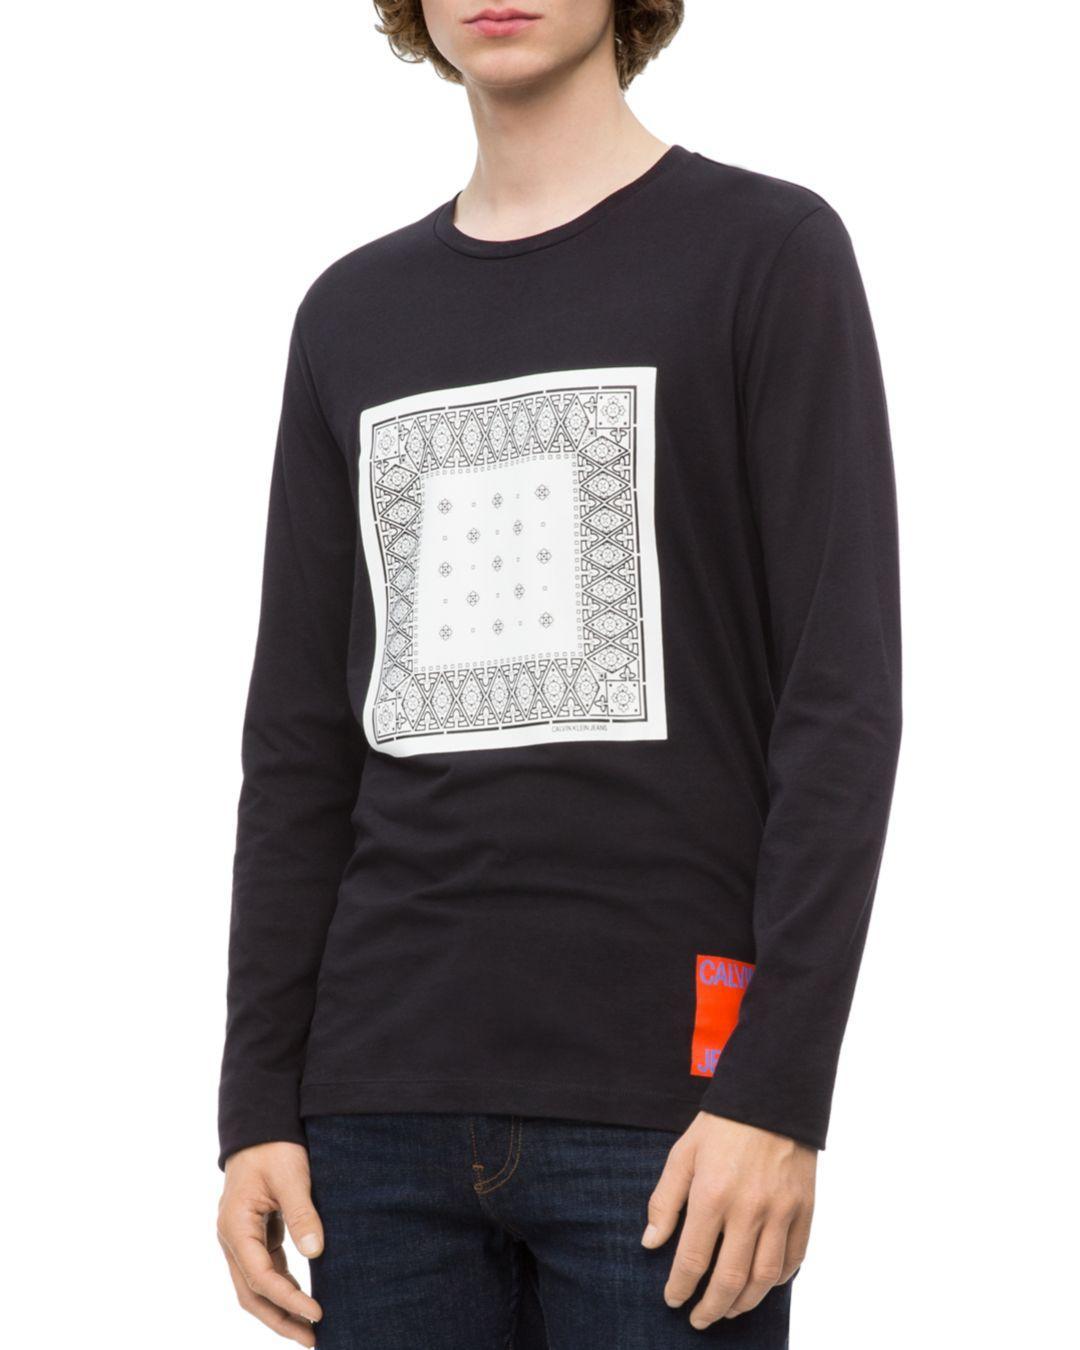 f867188dd9b7 Calvin Klein Long - Sleeve Bandana Graphic Tee in Black for Men - Lyst